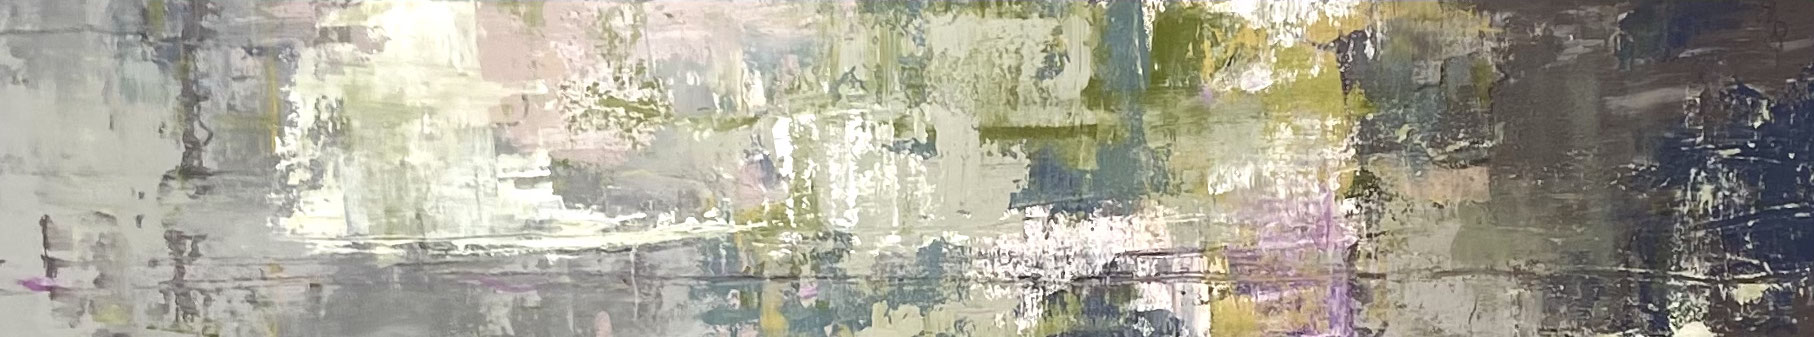 Acrylfarbe, Kreidefarbe und Ölpastellkreide auf Leinwand 30 x 150 cm